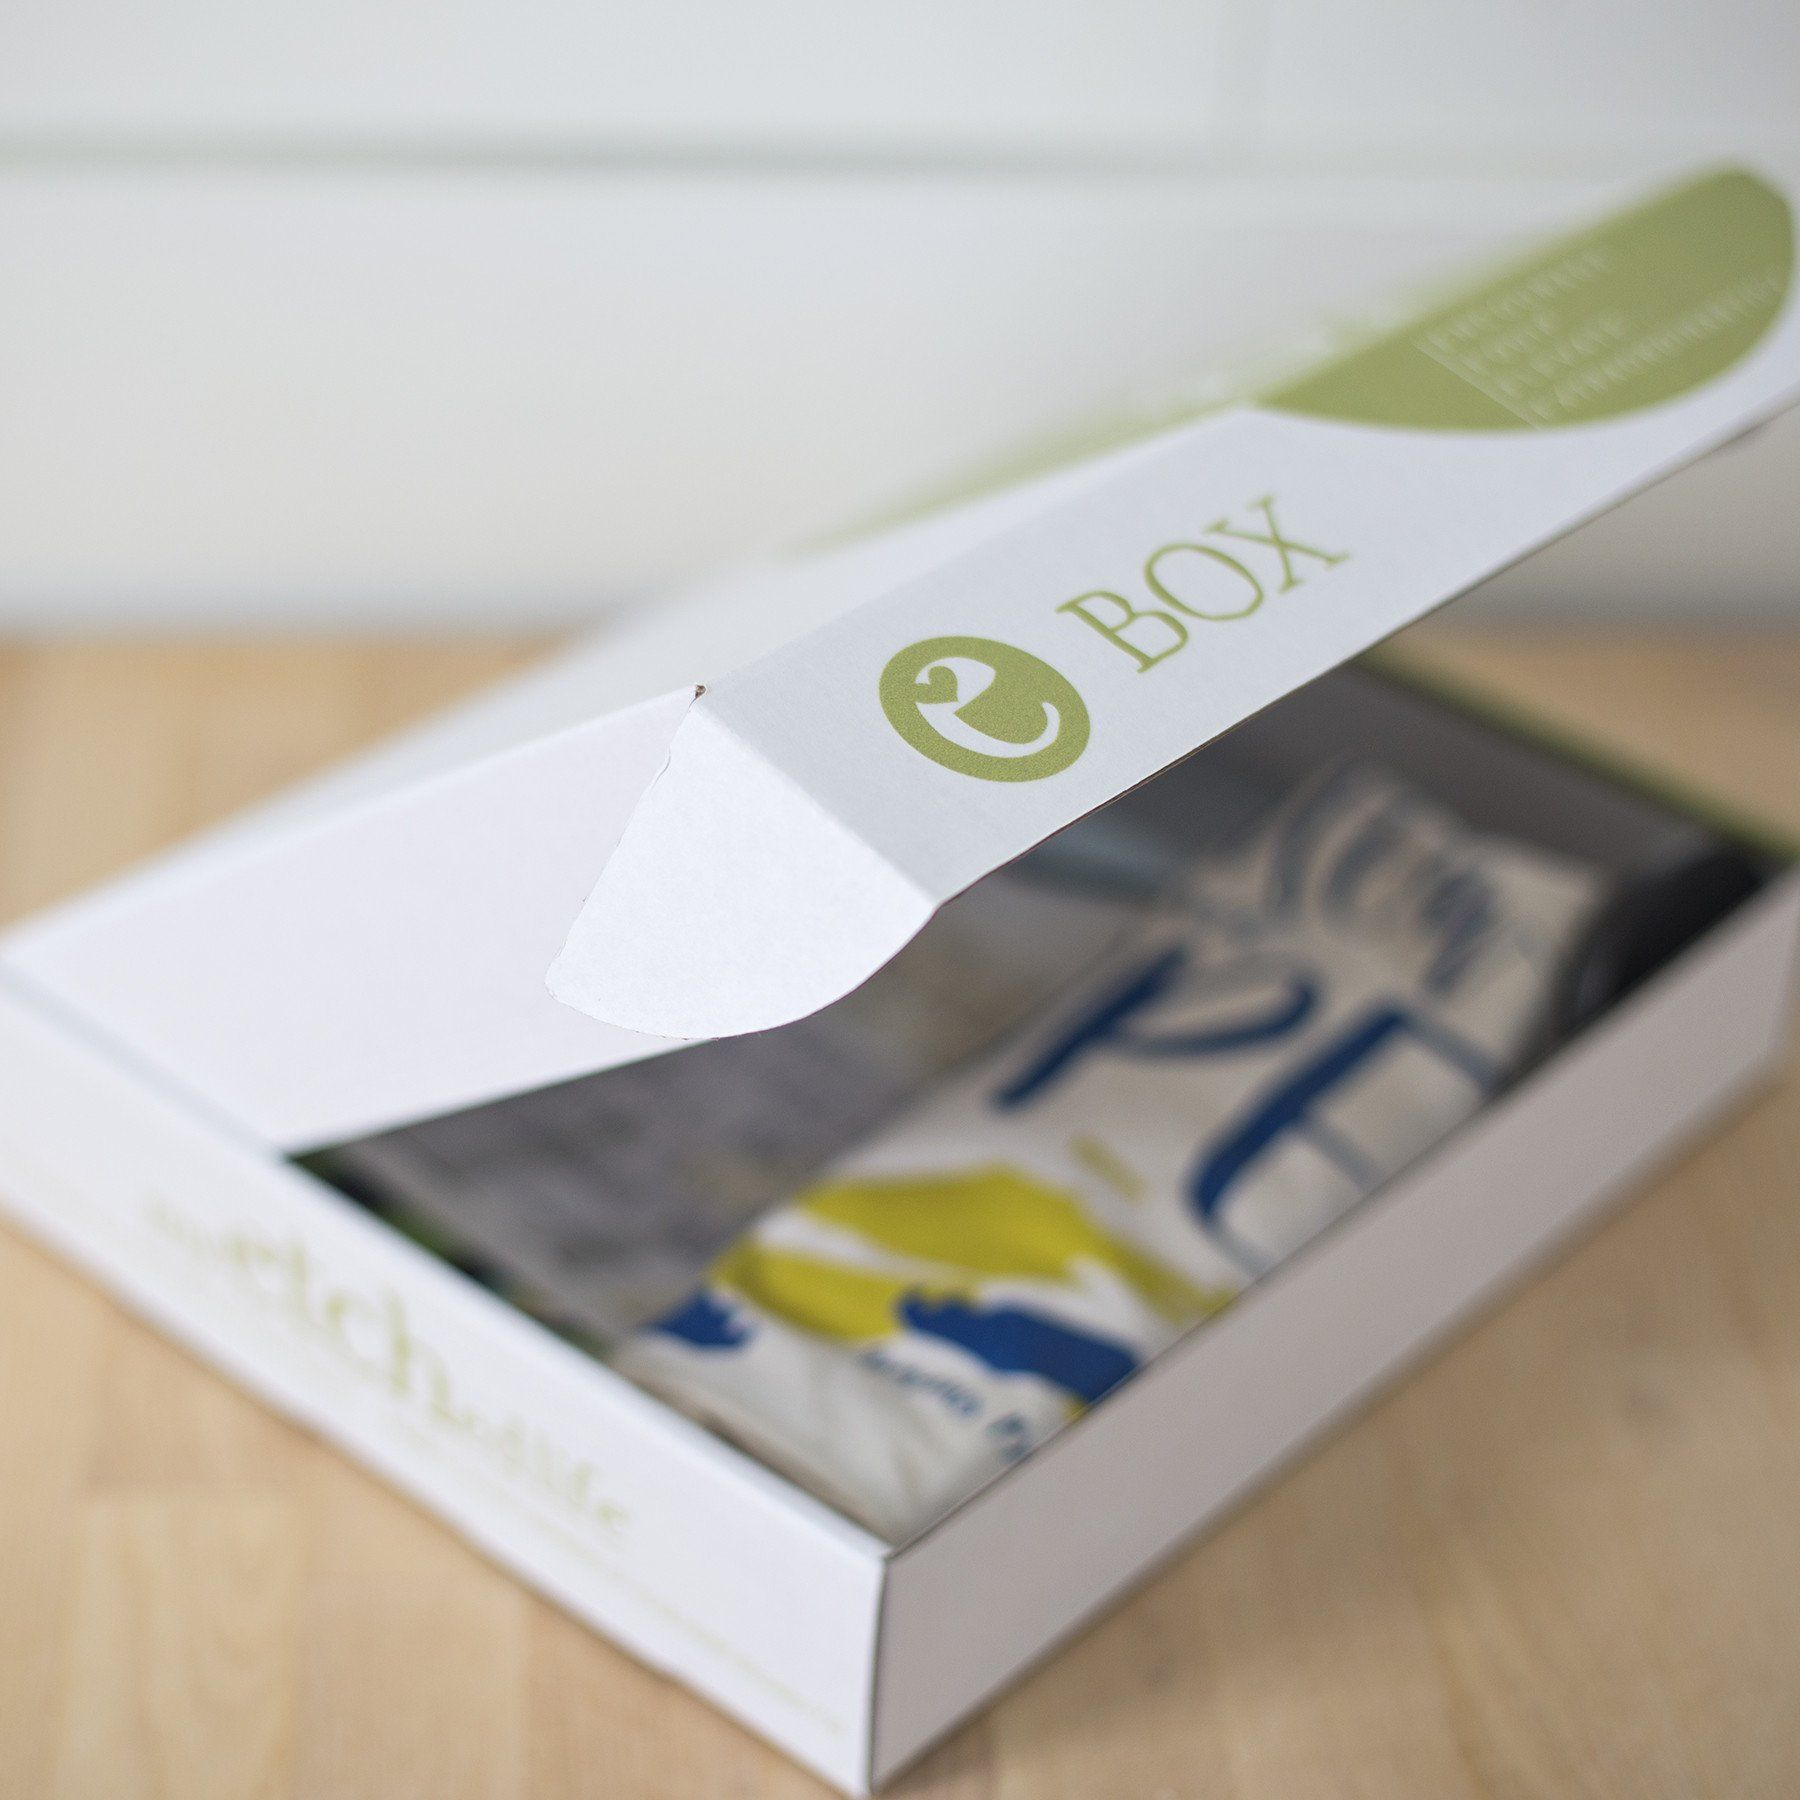 E-BOX for students with scripture encouragement | Assortment of Etch Items – EtchLife L.L.C.